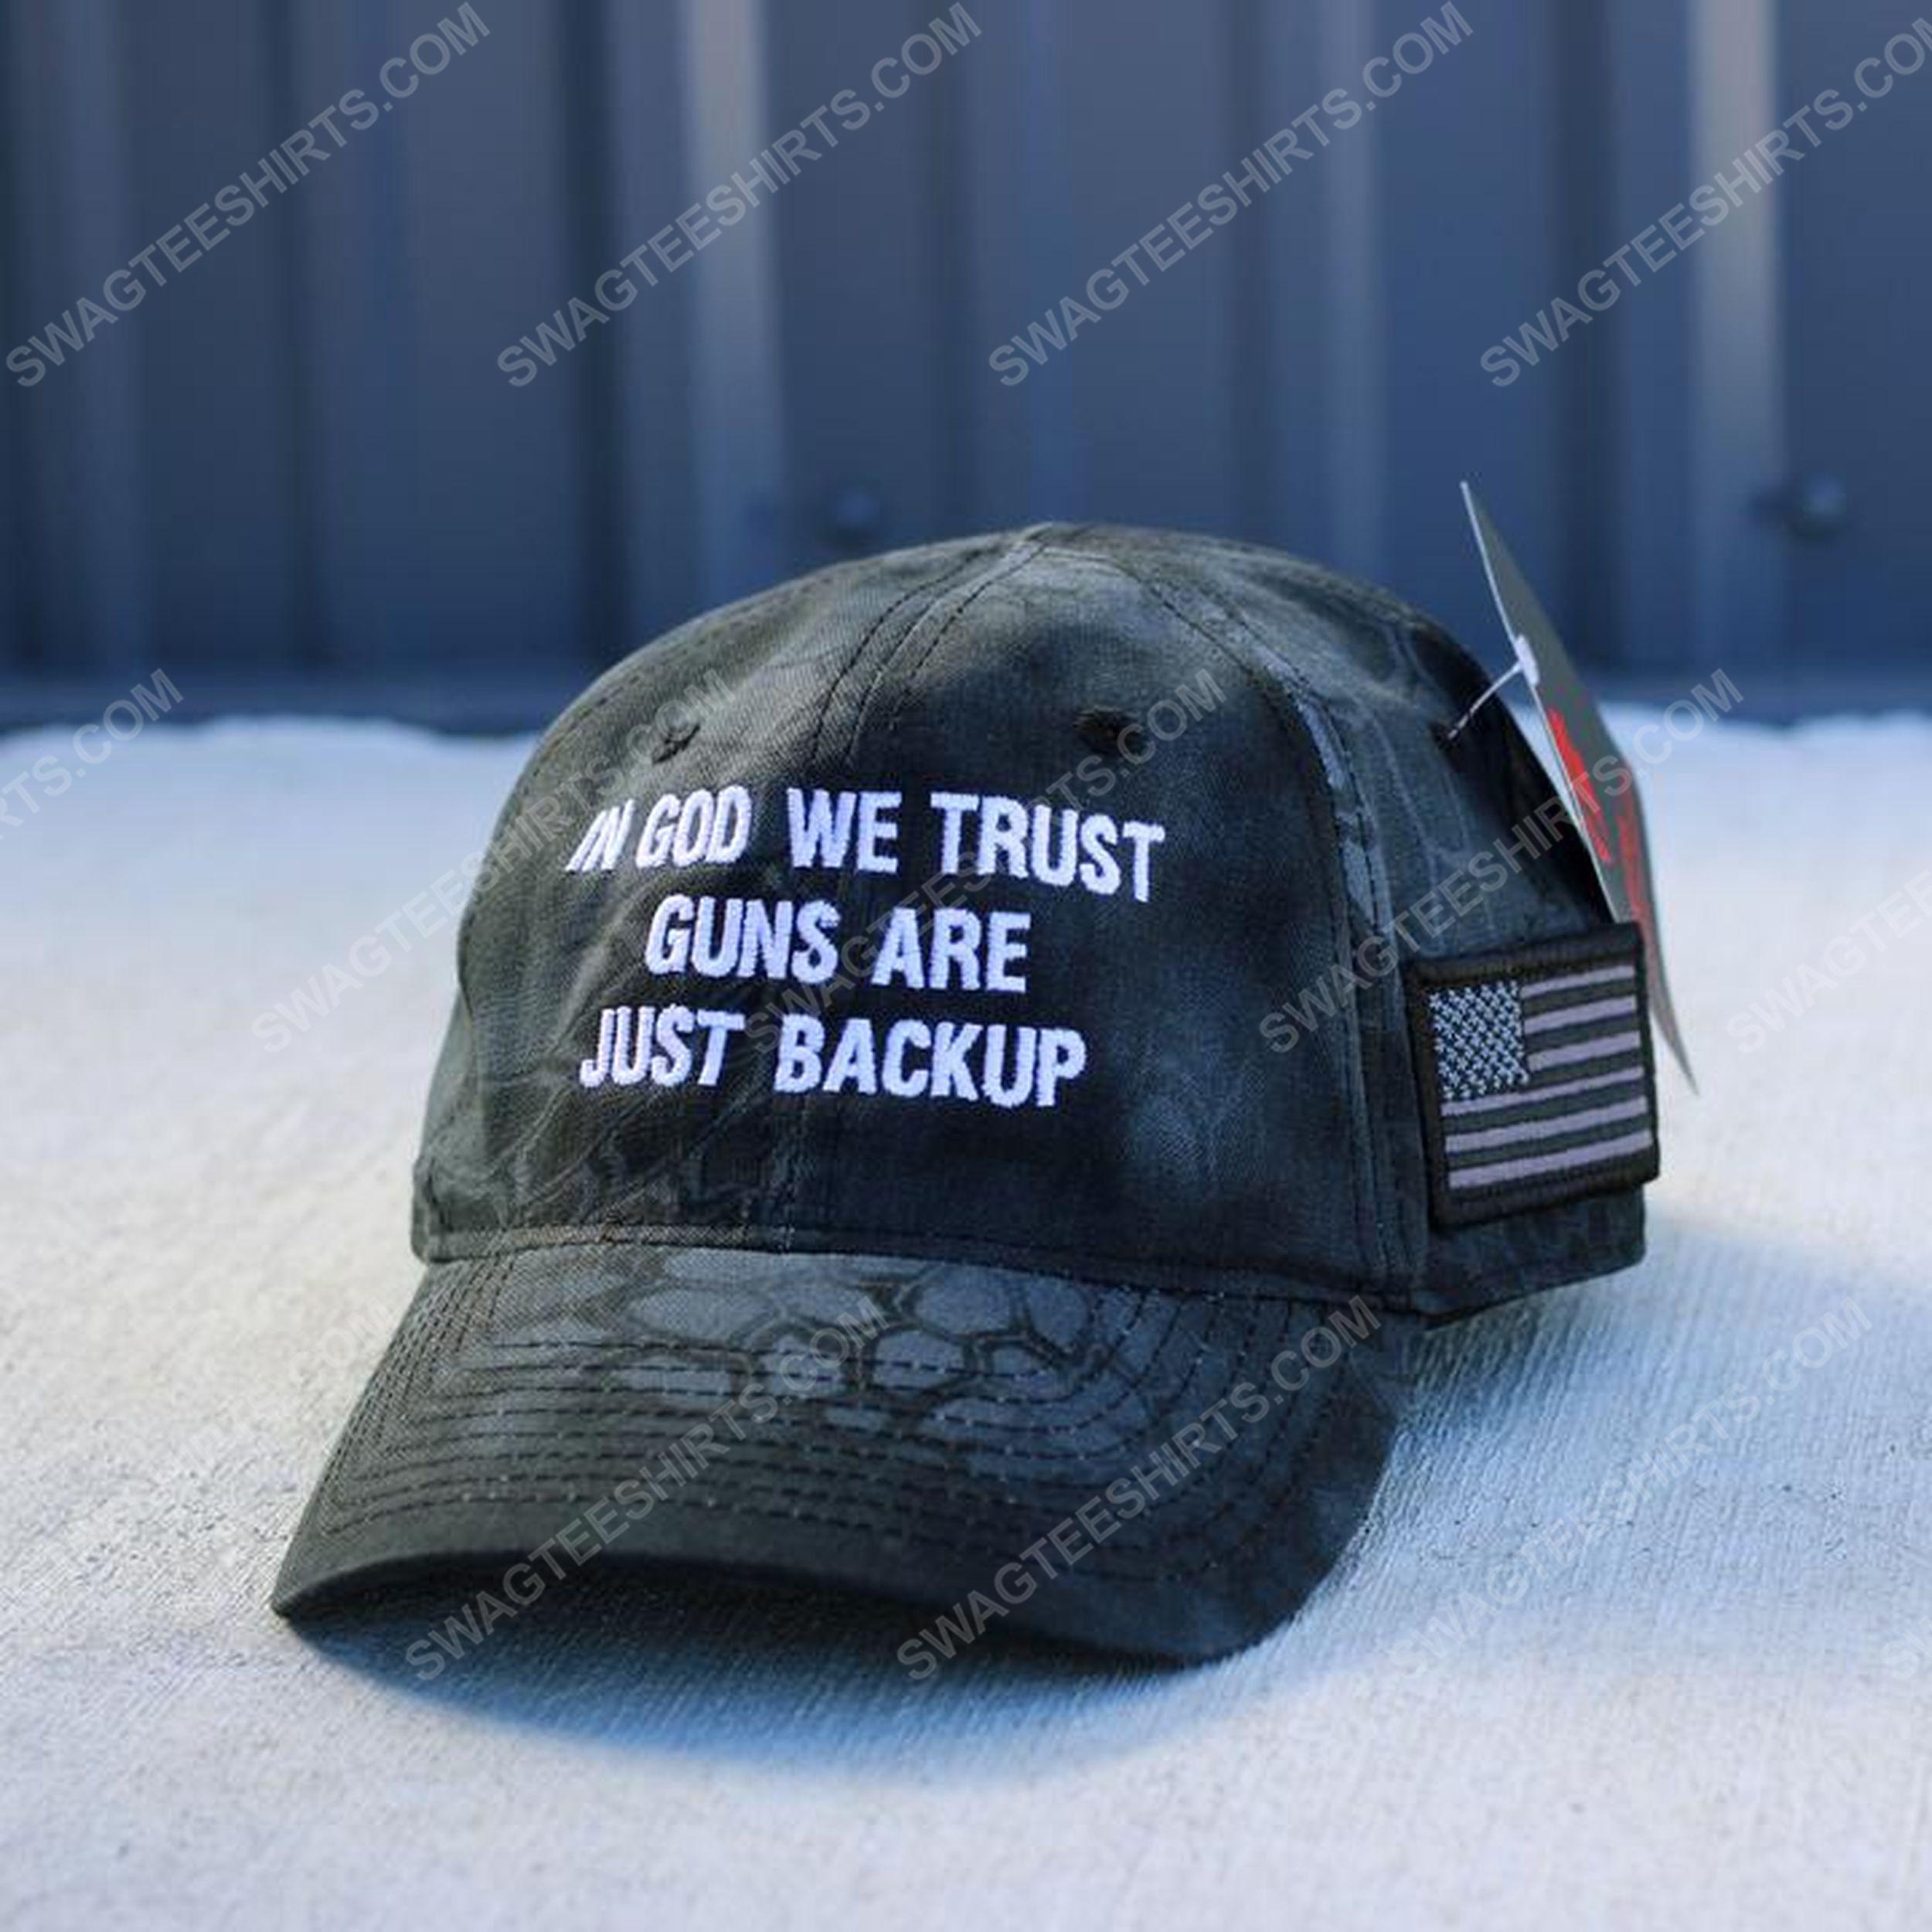 In God we trust guns are just backup full print classic hat 1 - Copy